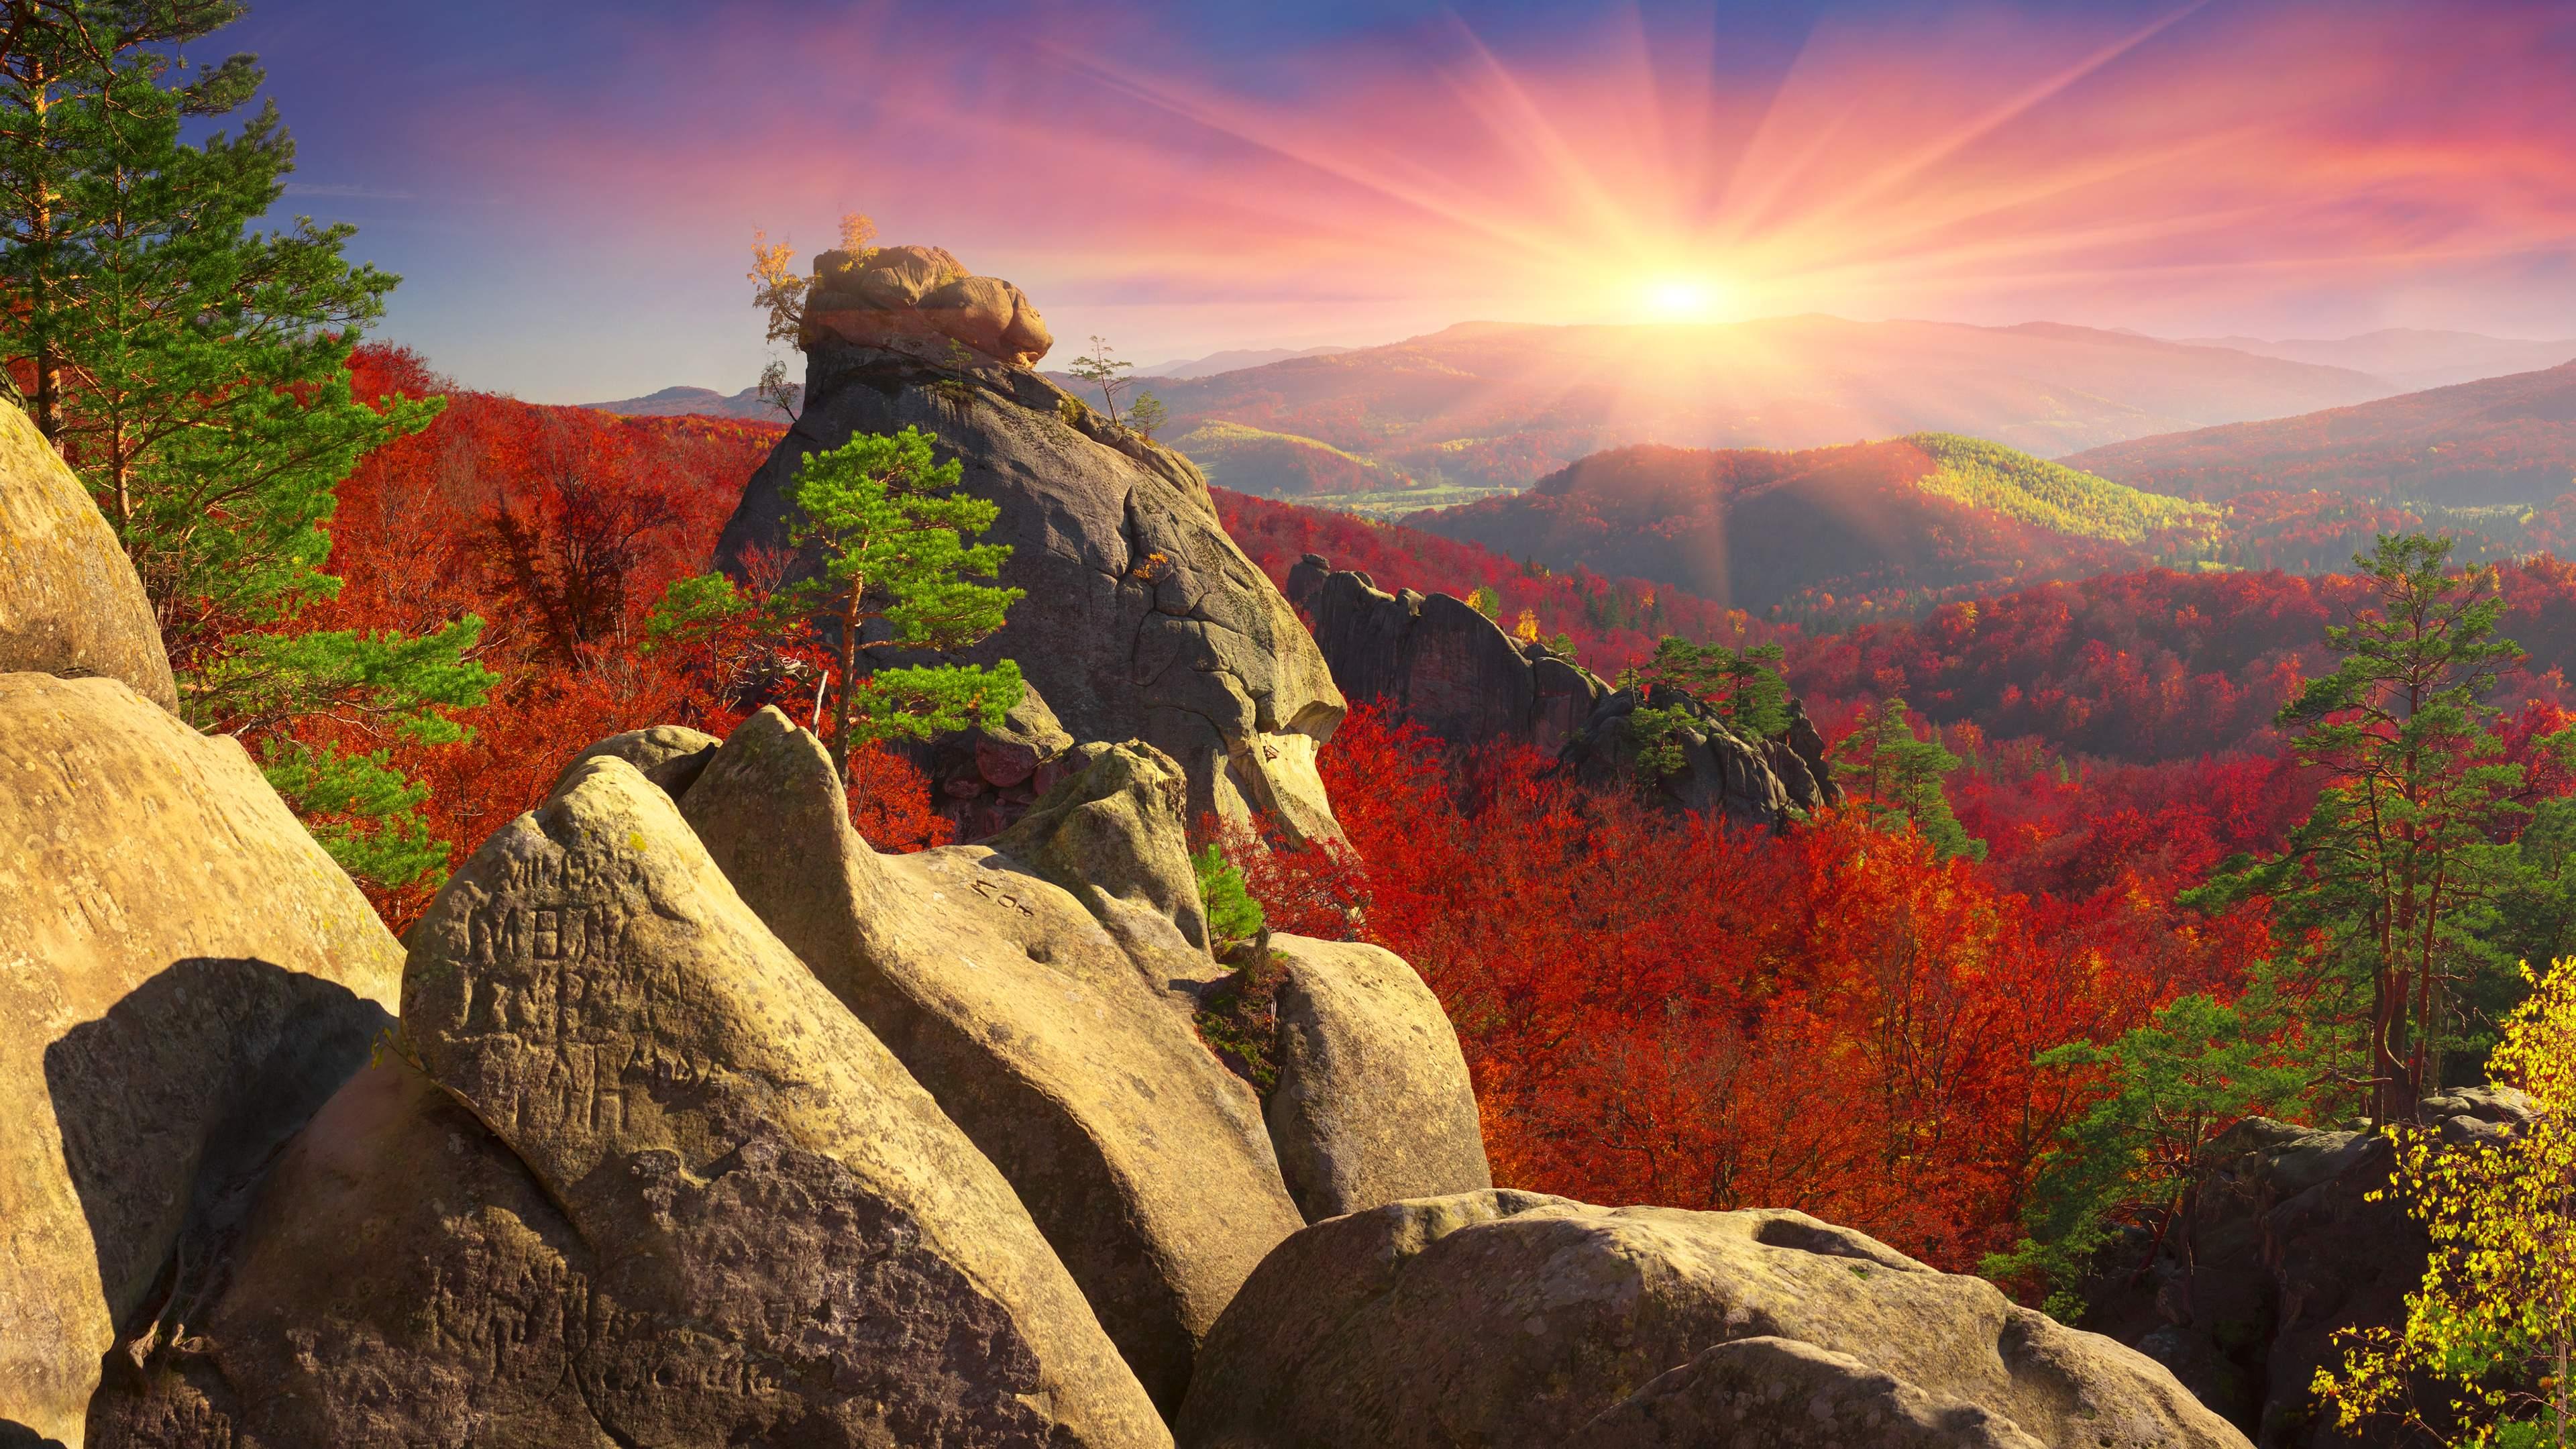 Beautiful Mountains at Sunrise 4K Wallpaper by ROGUE-RATTLESNAKE on ...